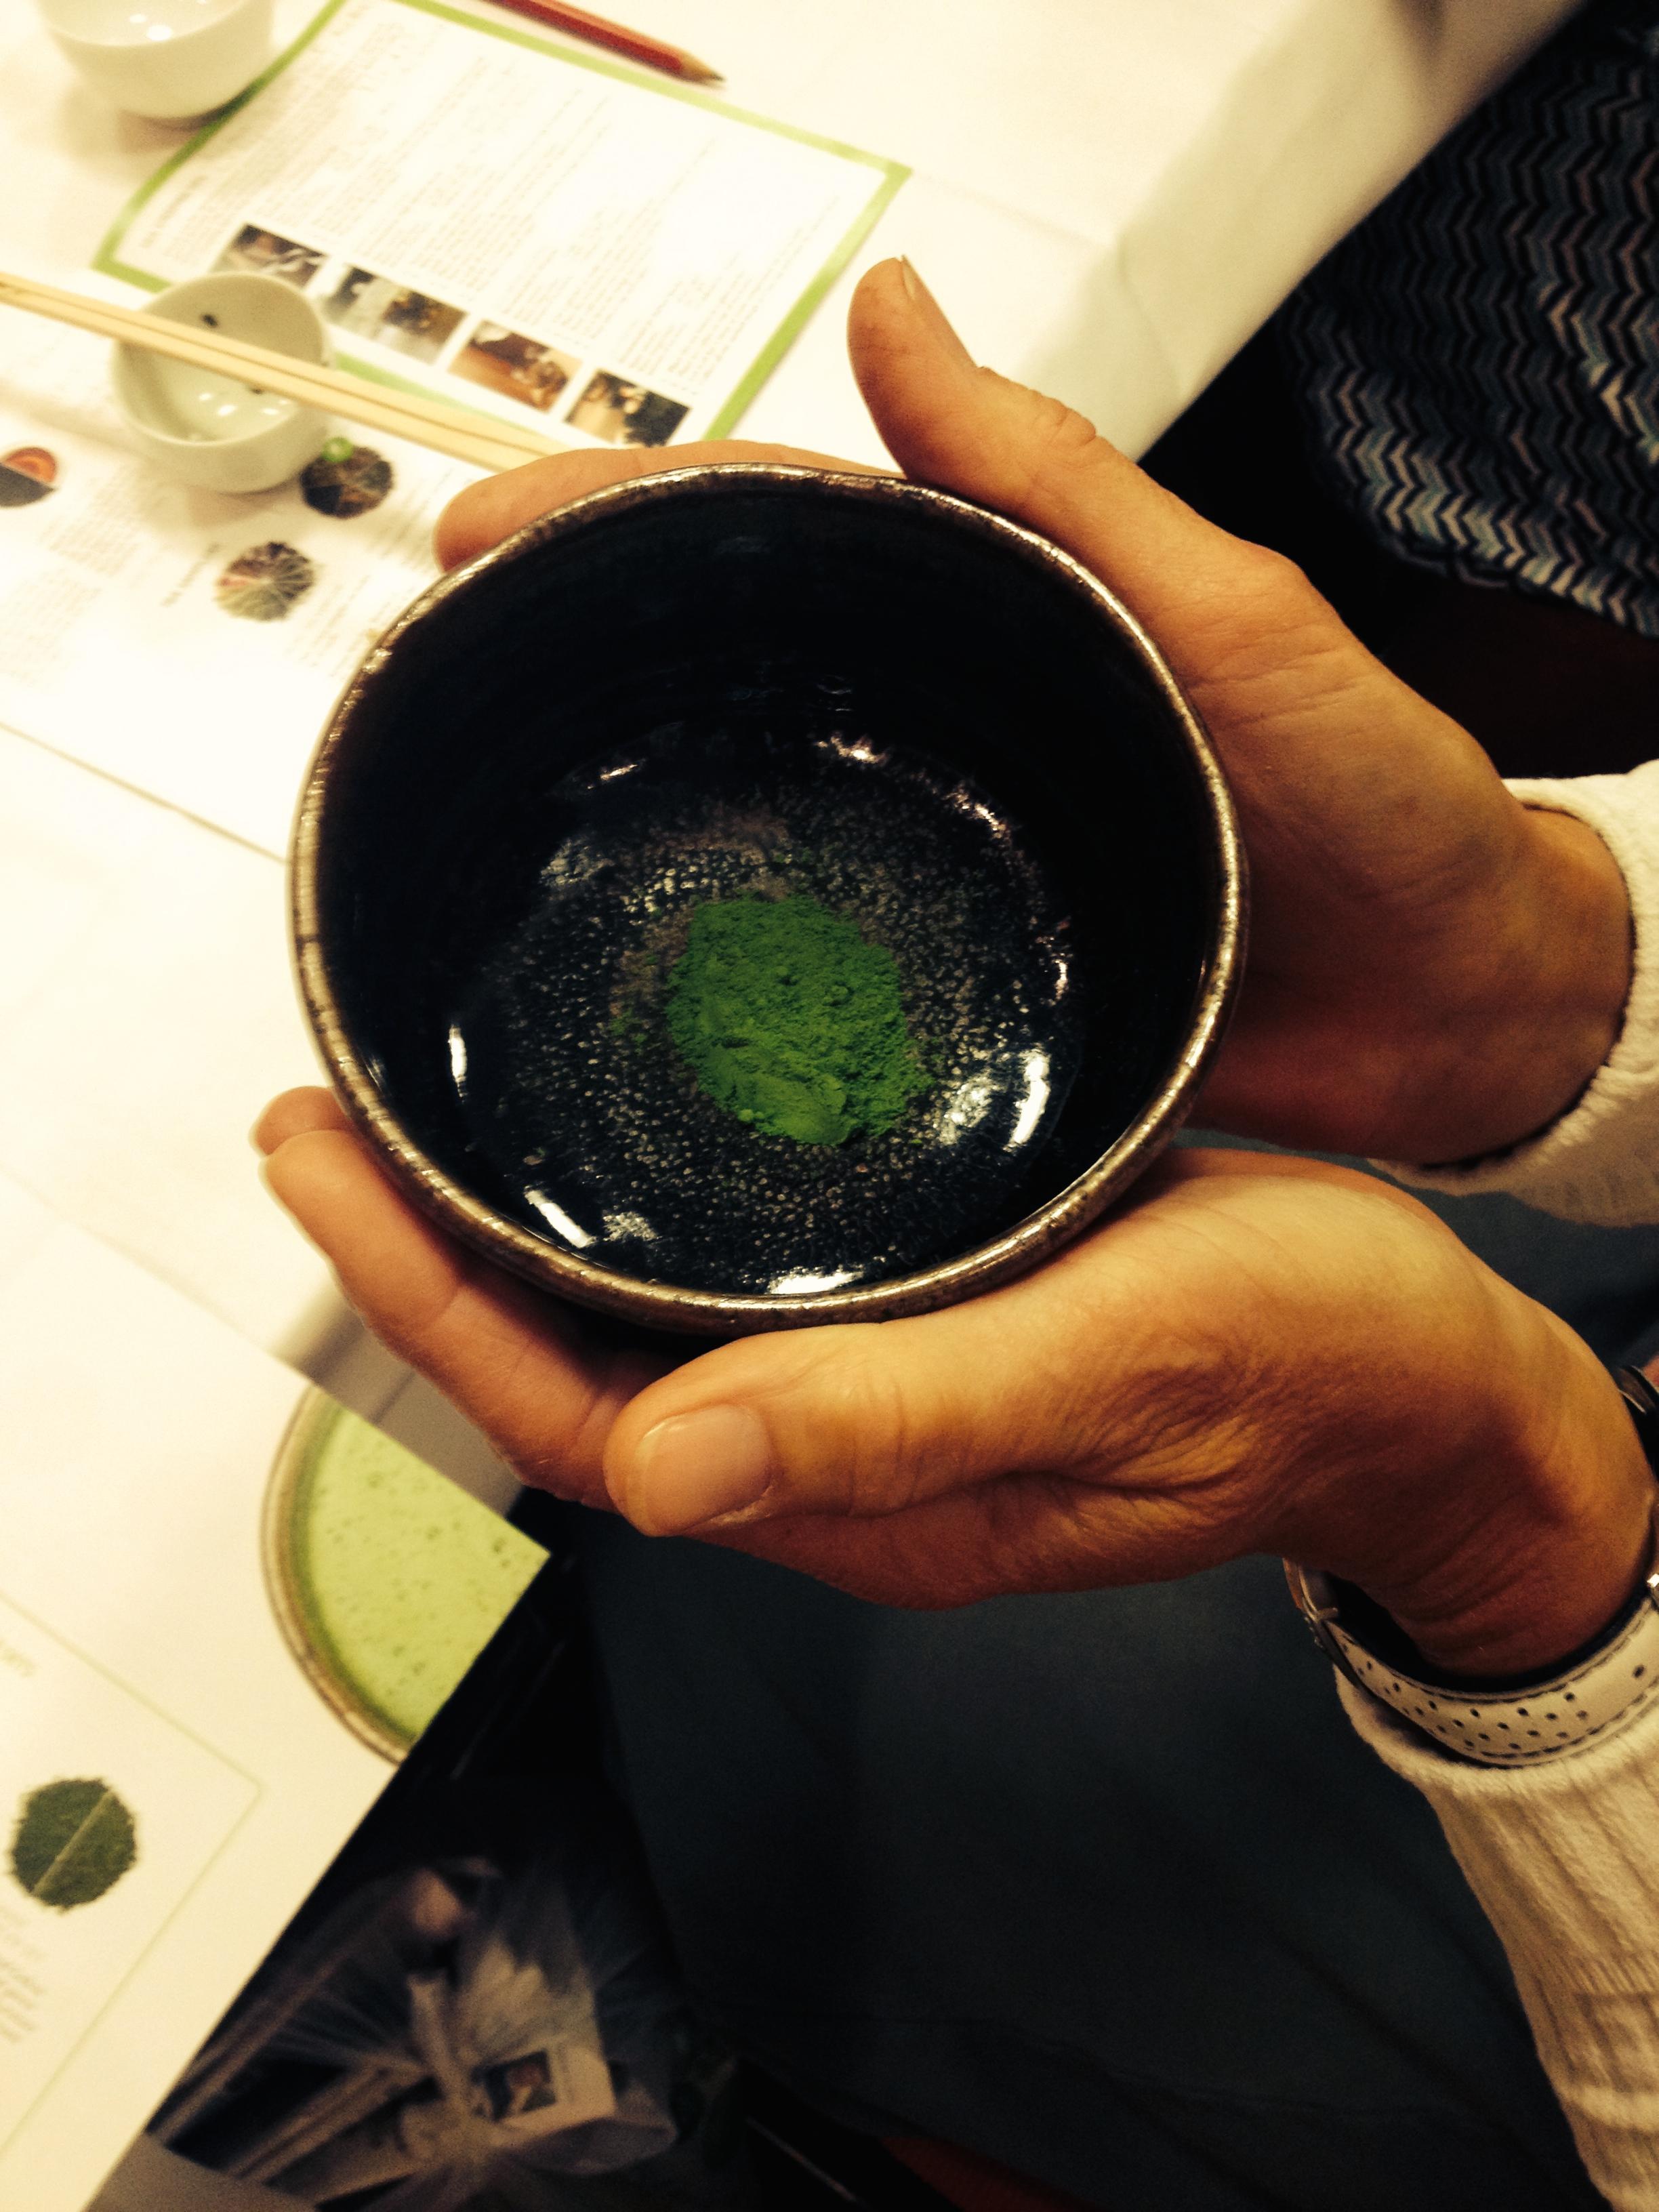 Green Tea powder ready for whisking